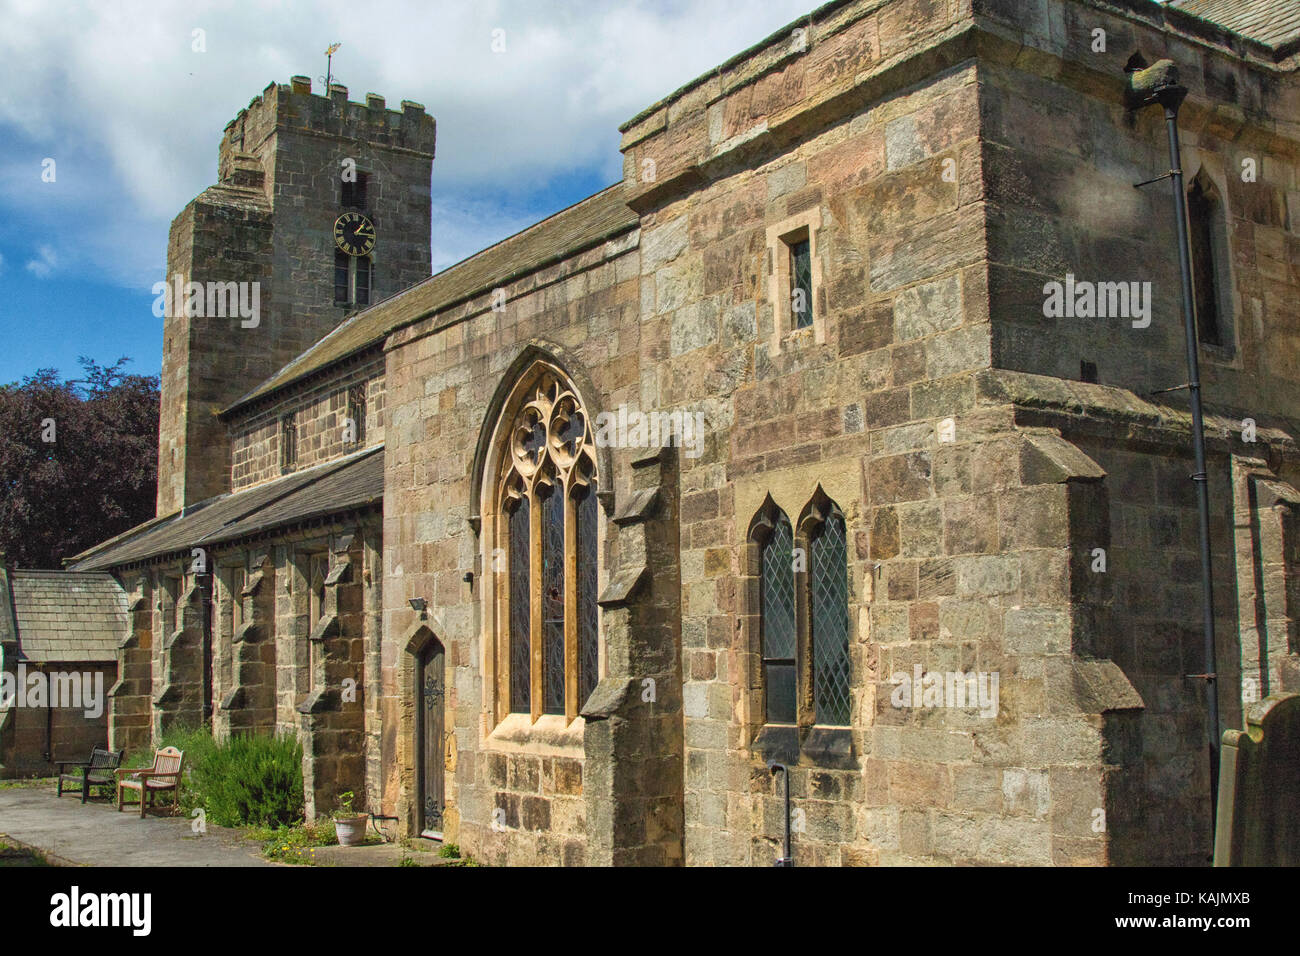 Church of All Saints,Ripley,North Yorkshire,UK. - Stock Image